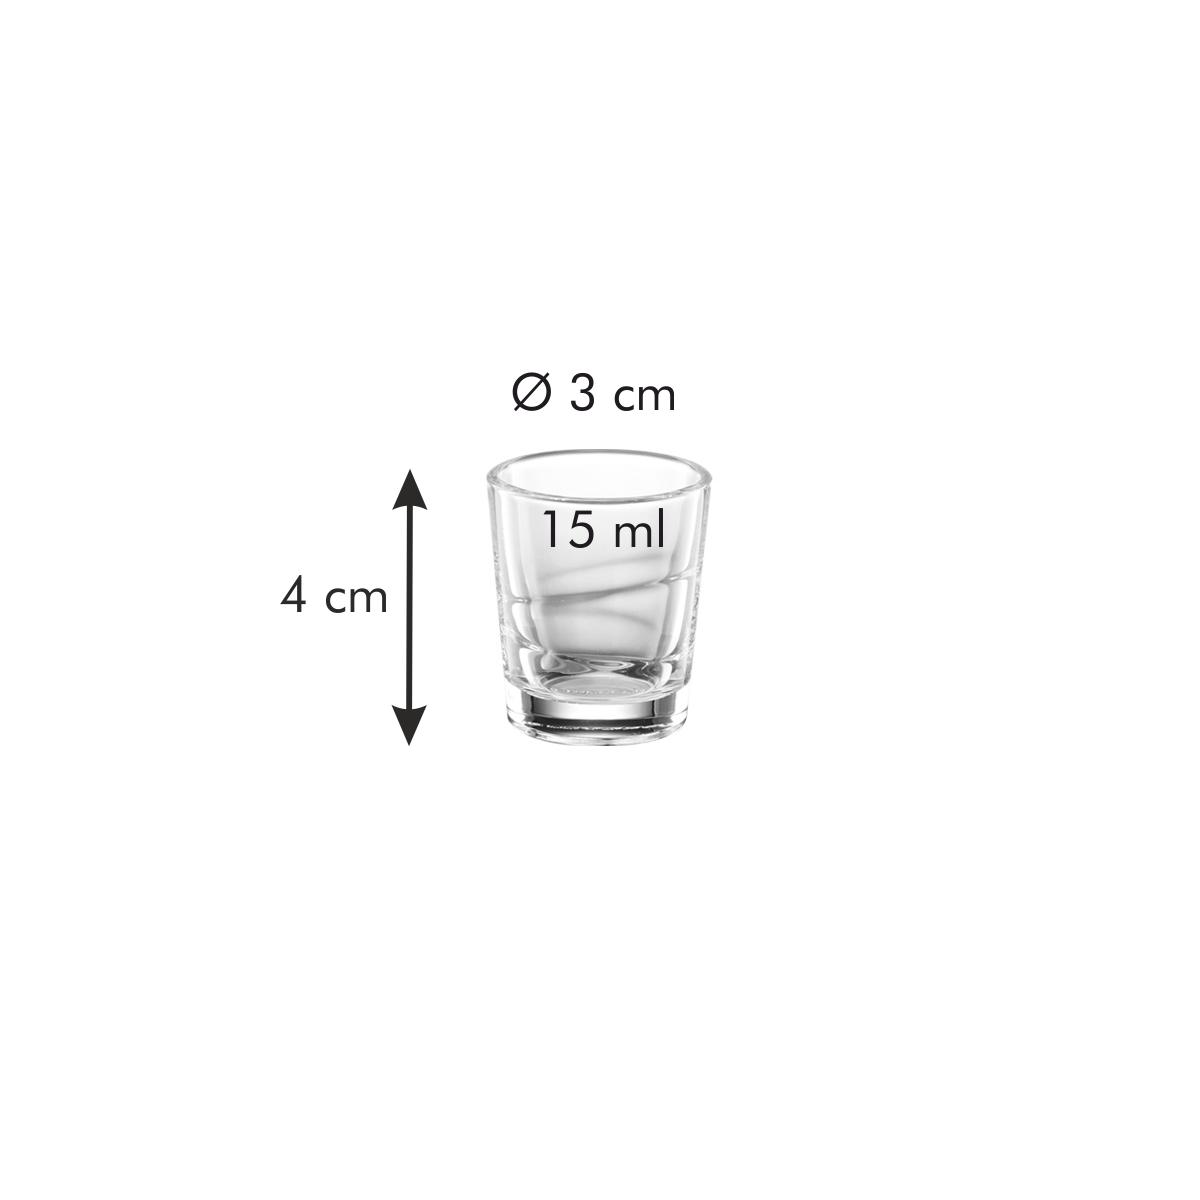 Panáček myDRINK 15 ml, 6 ks